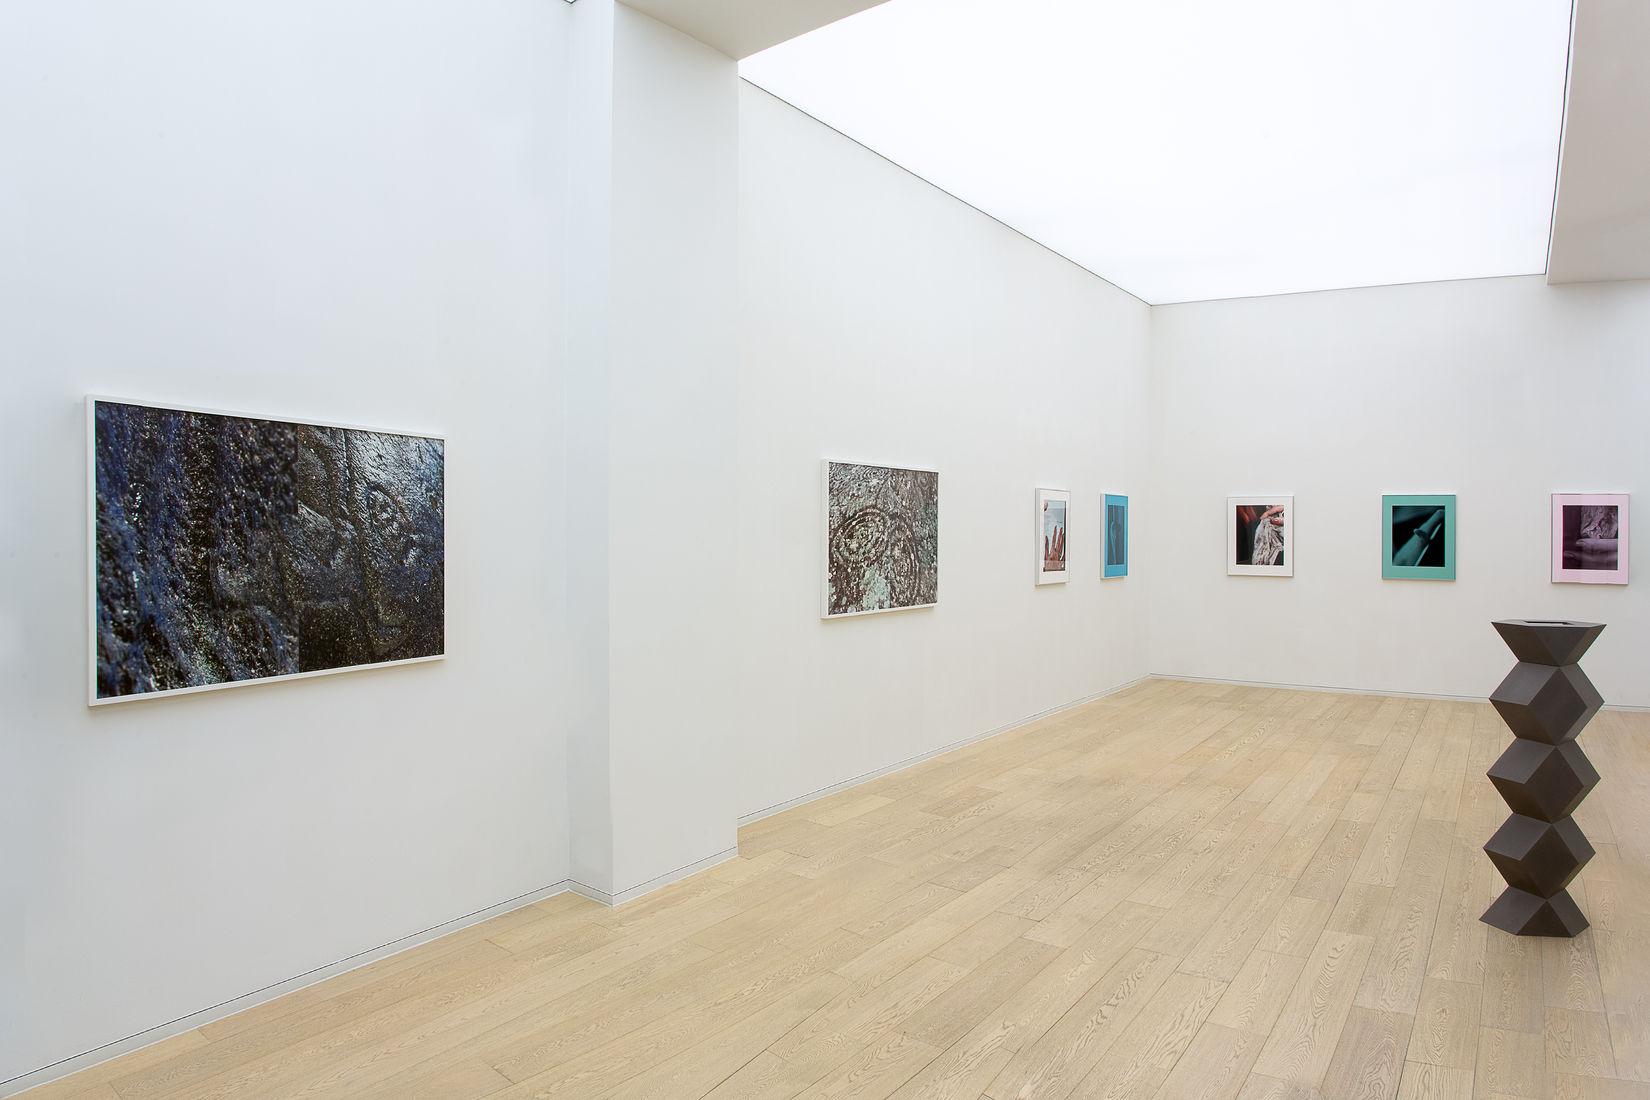 Simon Lee Gallery Presents: 'Sky, Rocks & Digits'